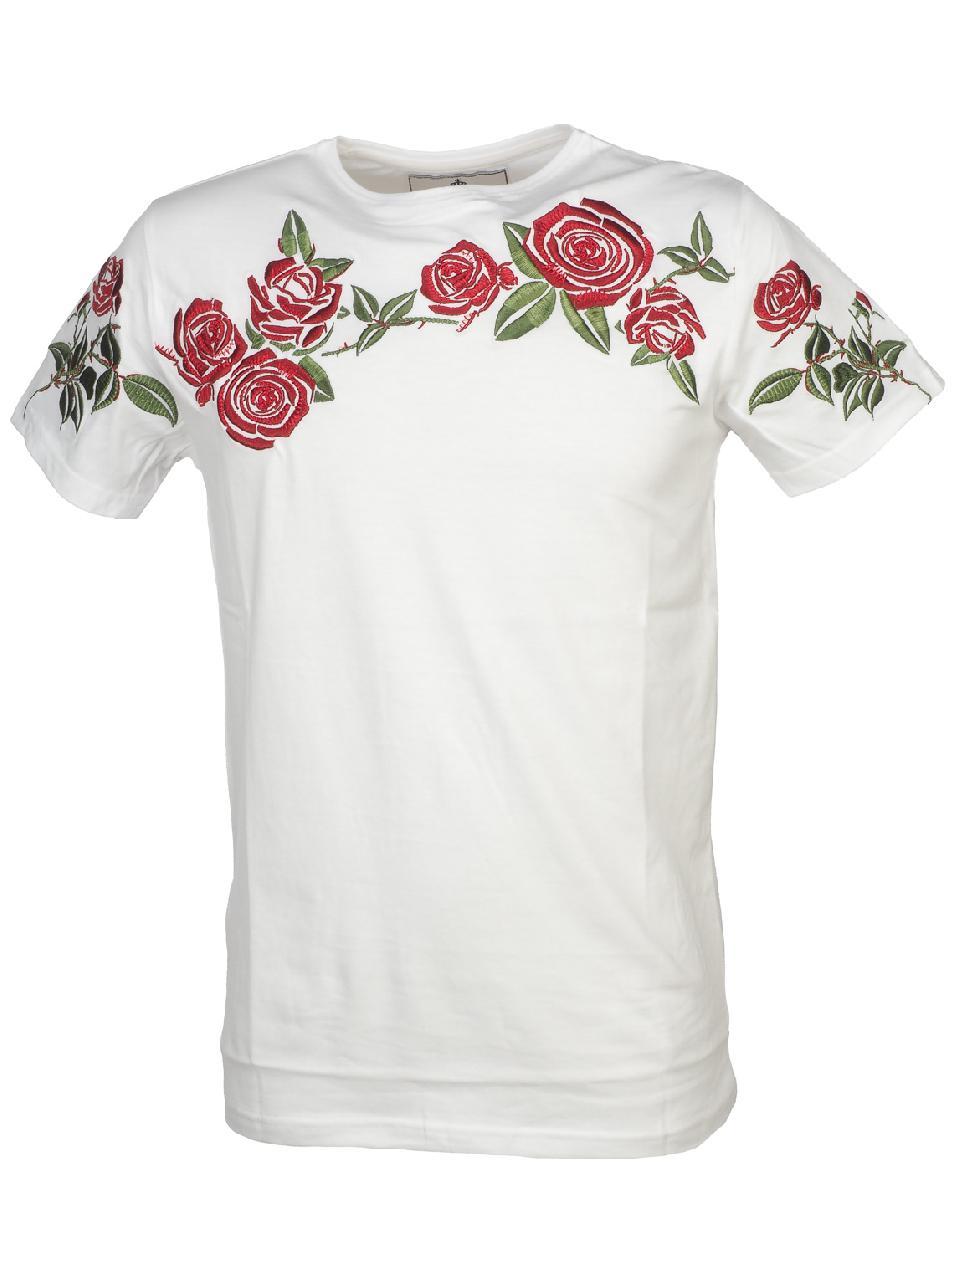 Short-Sleeve-T-Shirt-Hite-Couture-Madiner-White-Mc-Tee-White-11526-New thumbnail 4